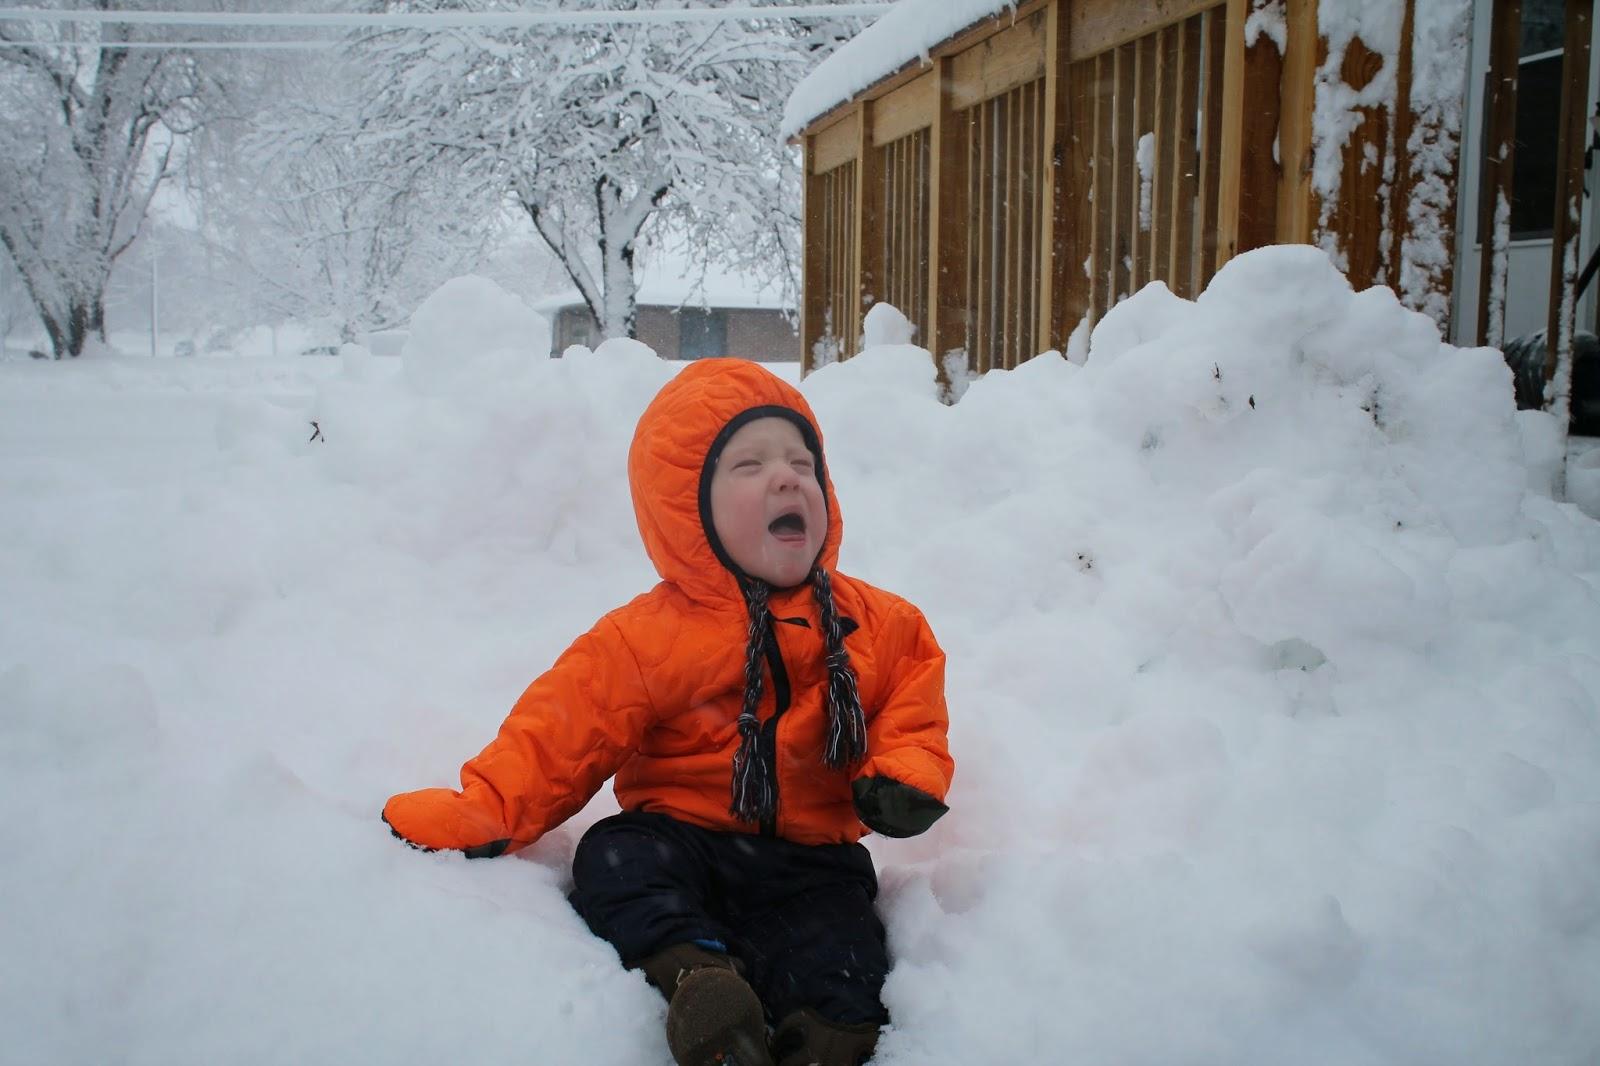 Mdzg One Snowy Day